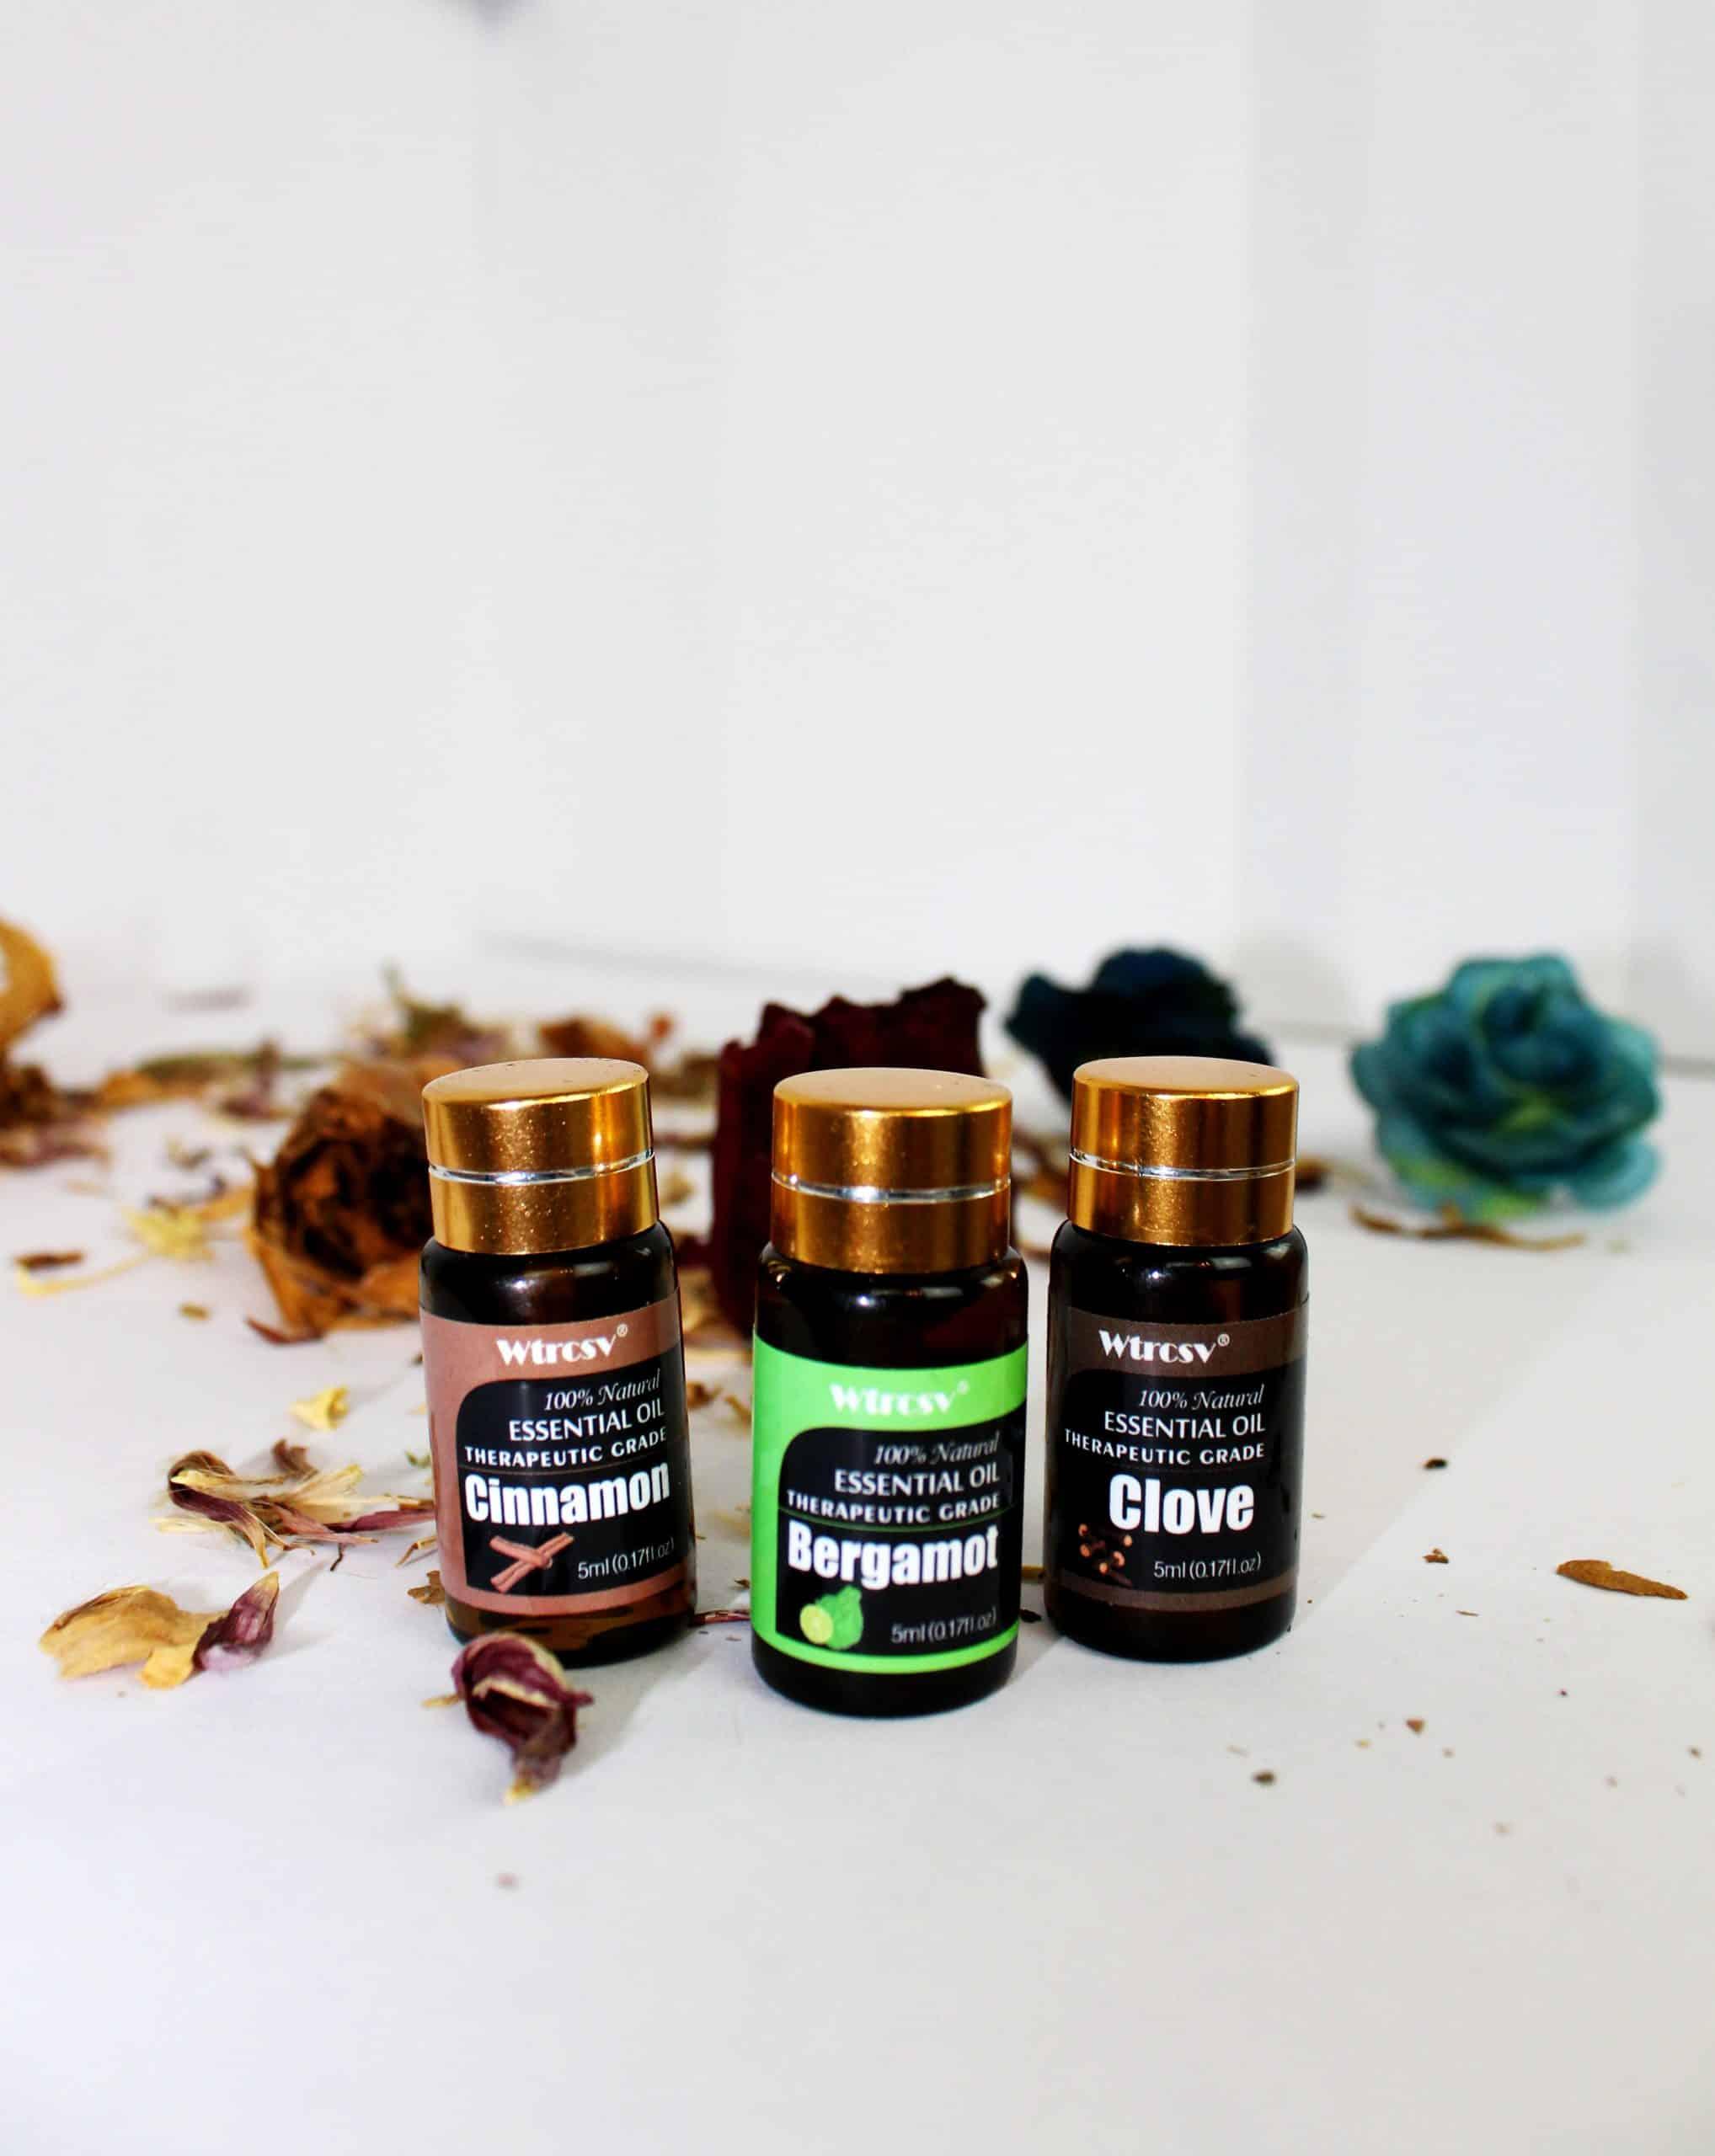 Cinnamon Bergamot Clove scaled